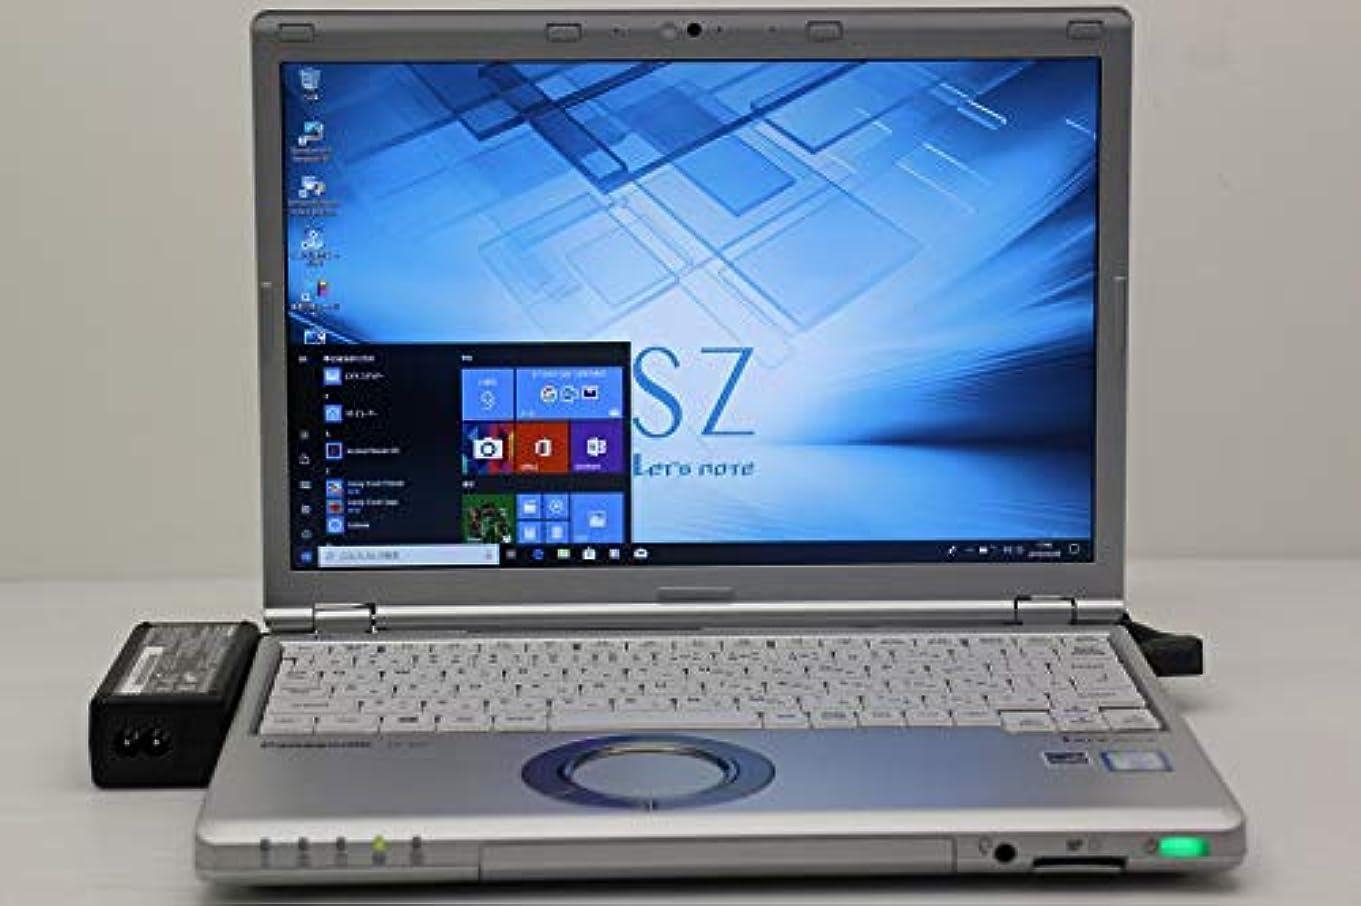 ミシン目小切手氏【中古】 Panasonic CF-SZ5ADAKS Core i5 6300U 2.4GHz/4GB/320GB/12.1W/WUXGA(1920x1200)/Win10